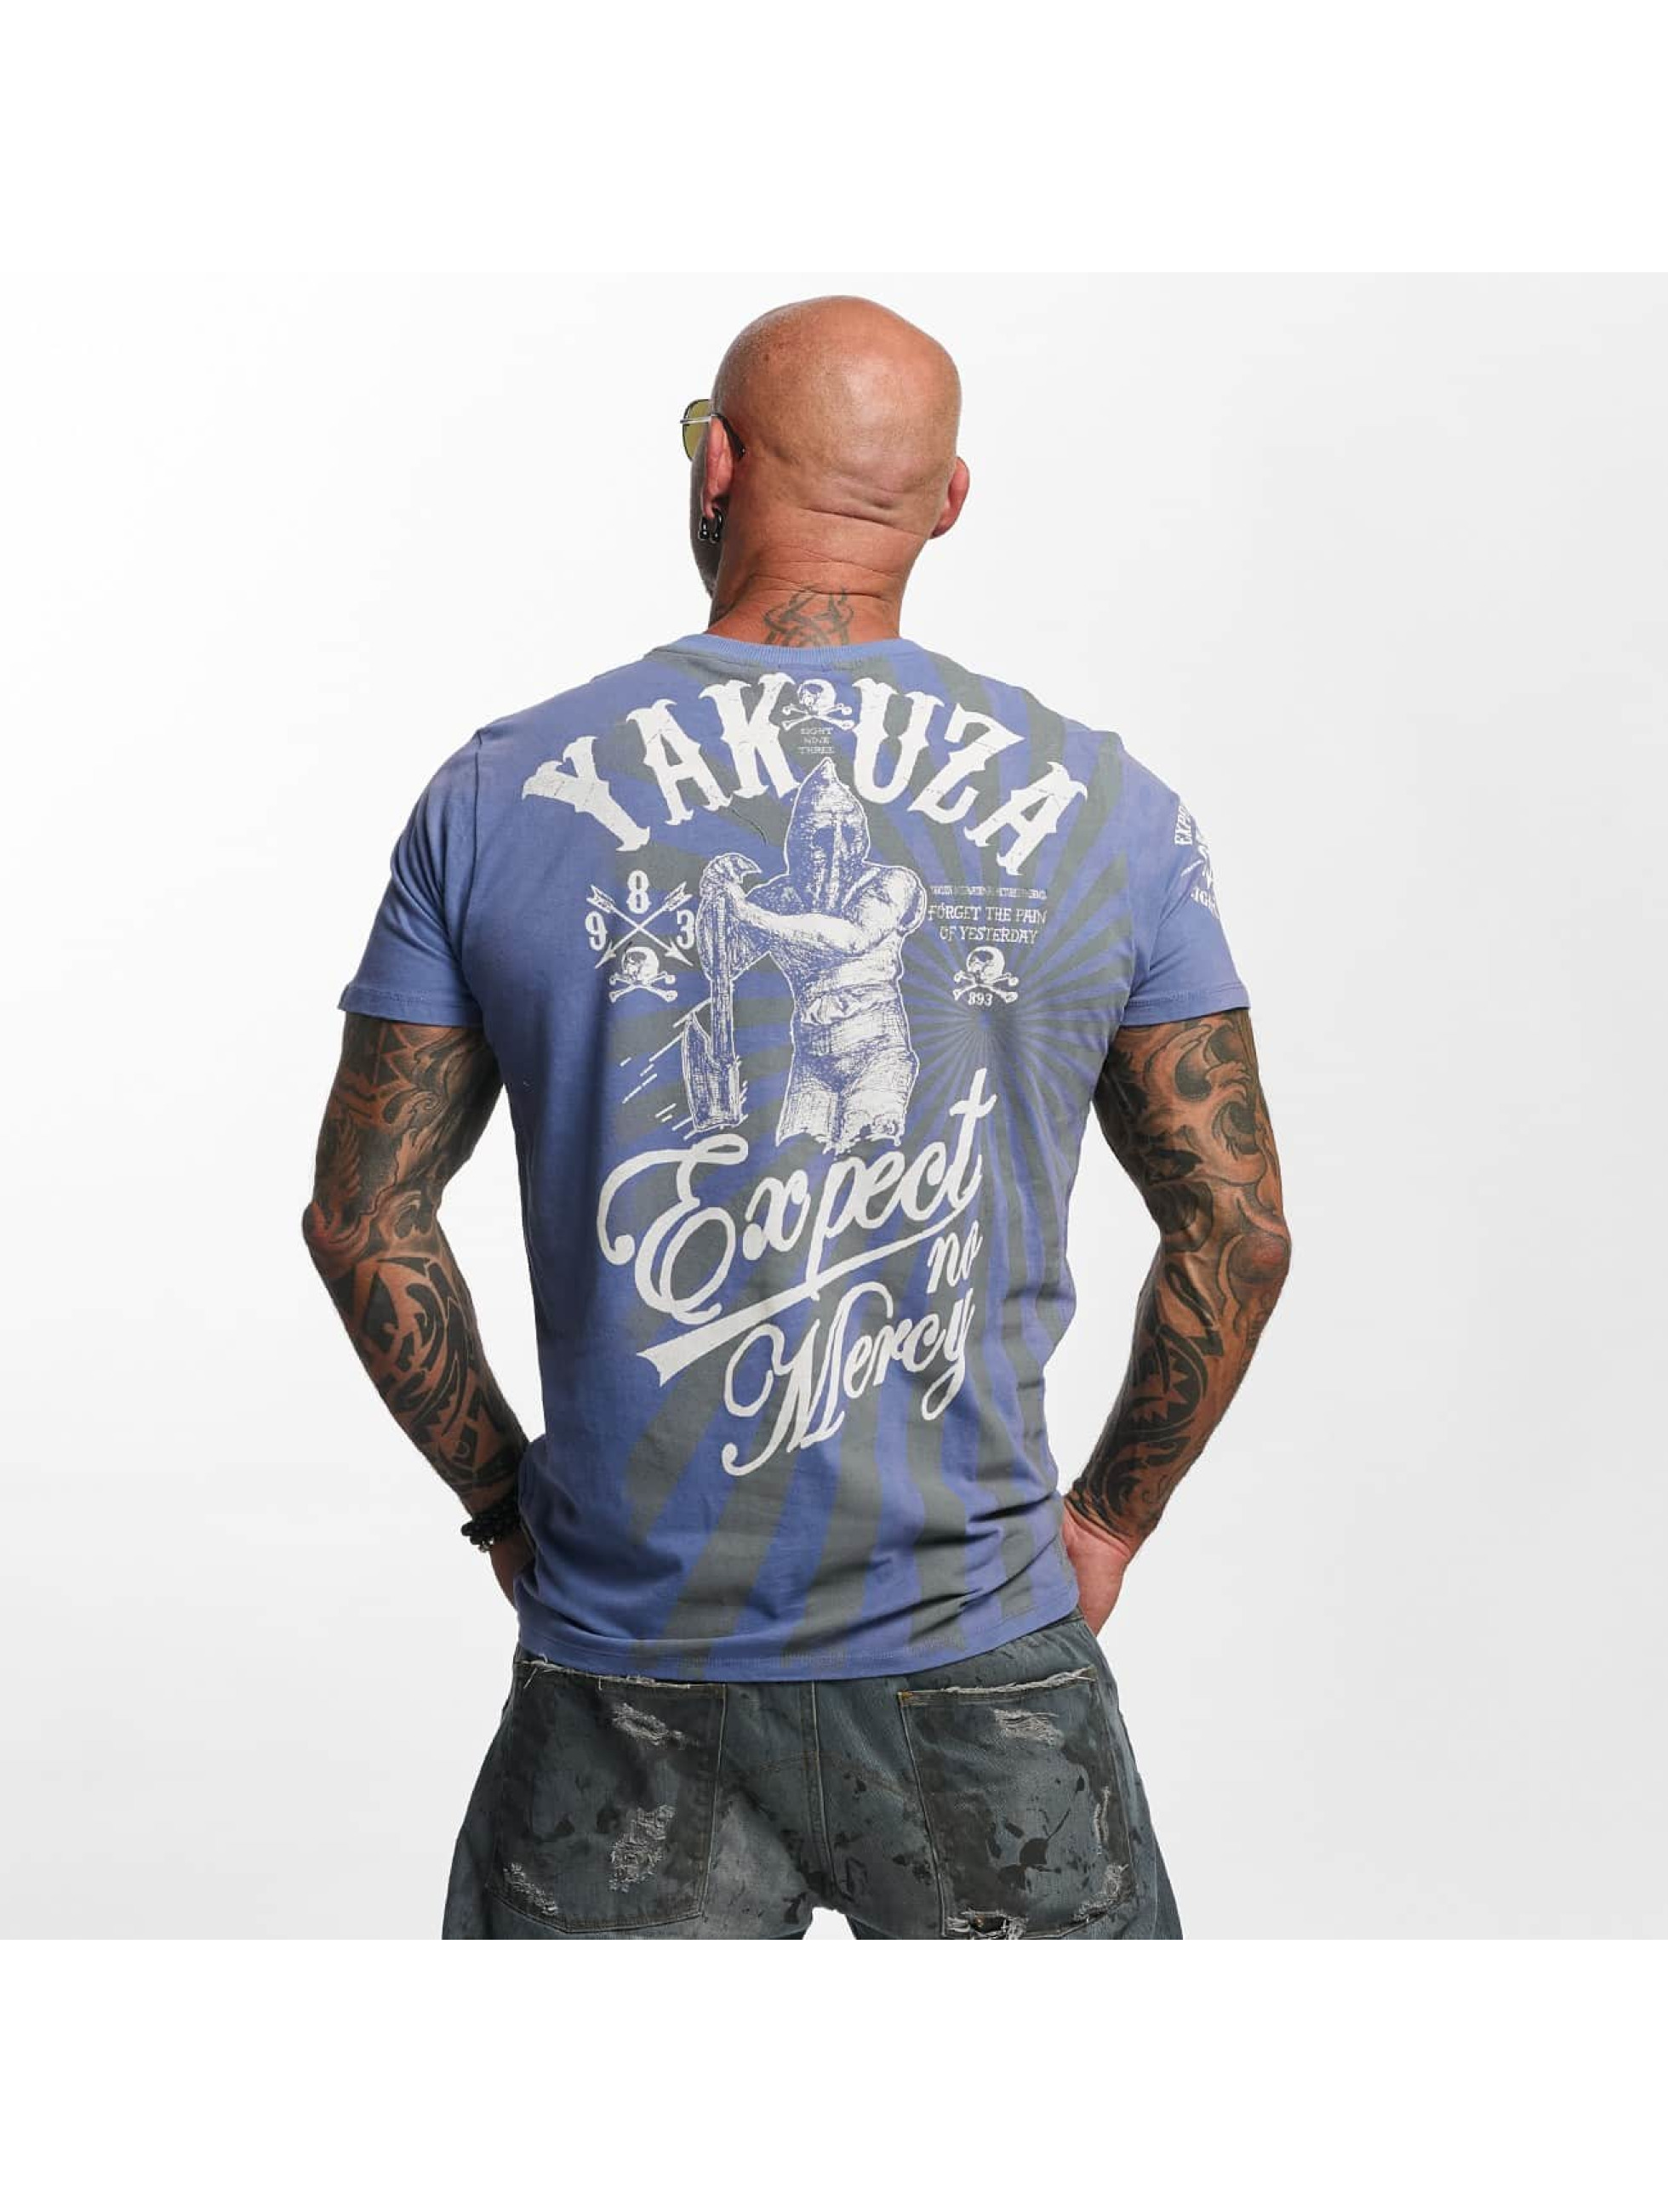 Yakuza T-shirt Expect No viola